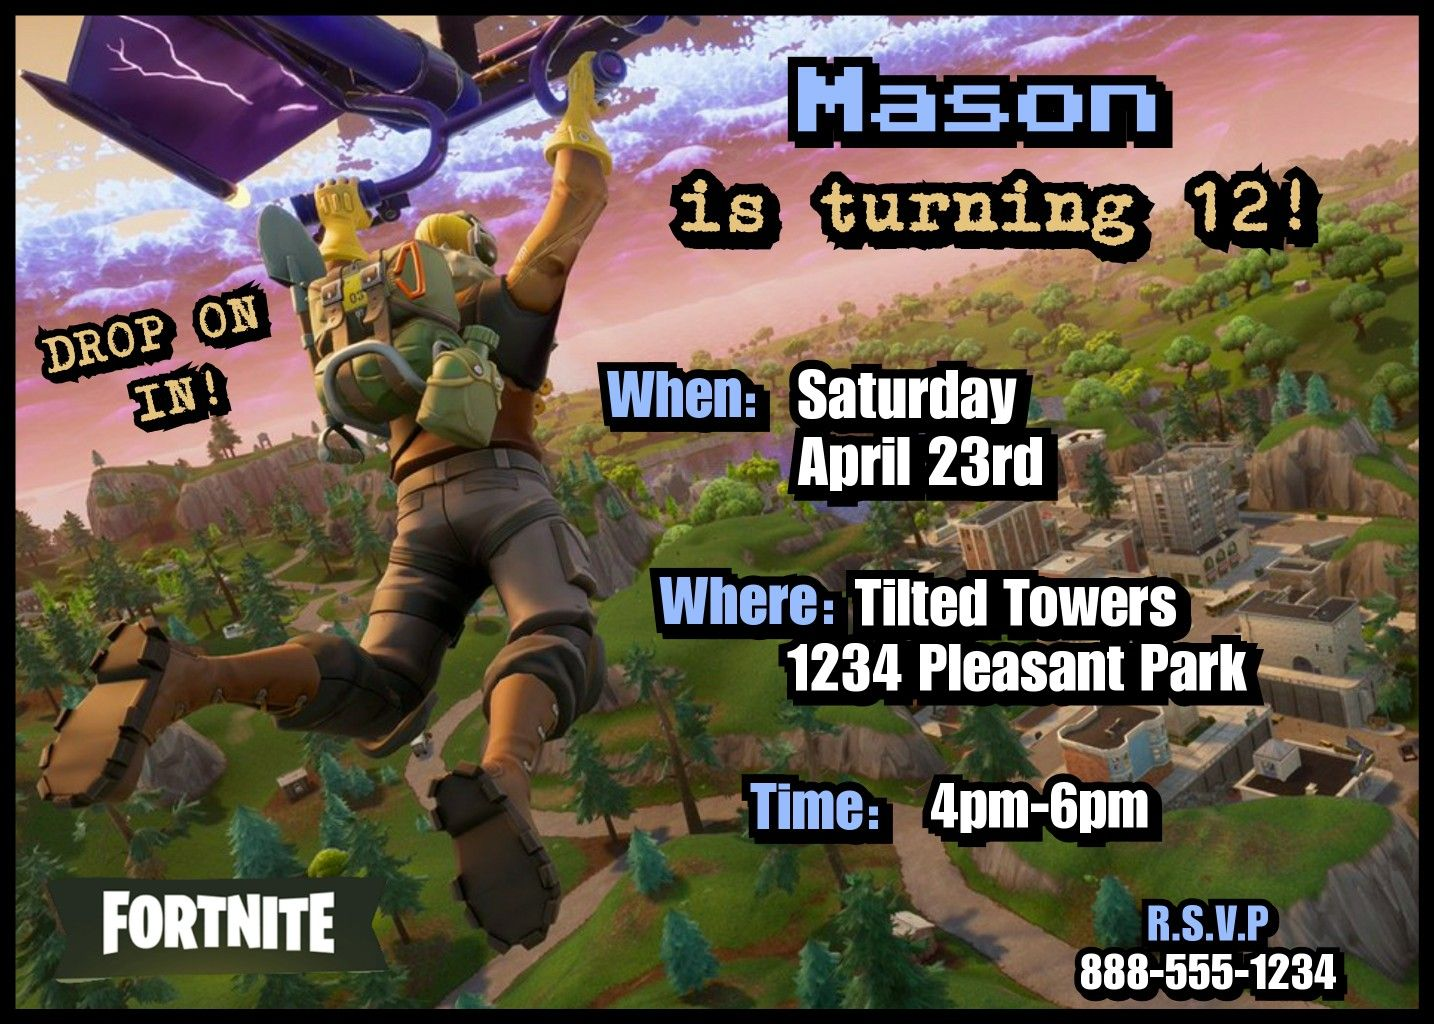 Fortnite Party Invitations!